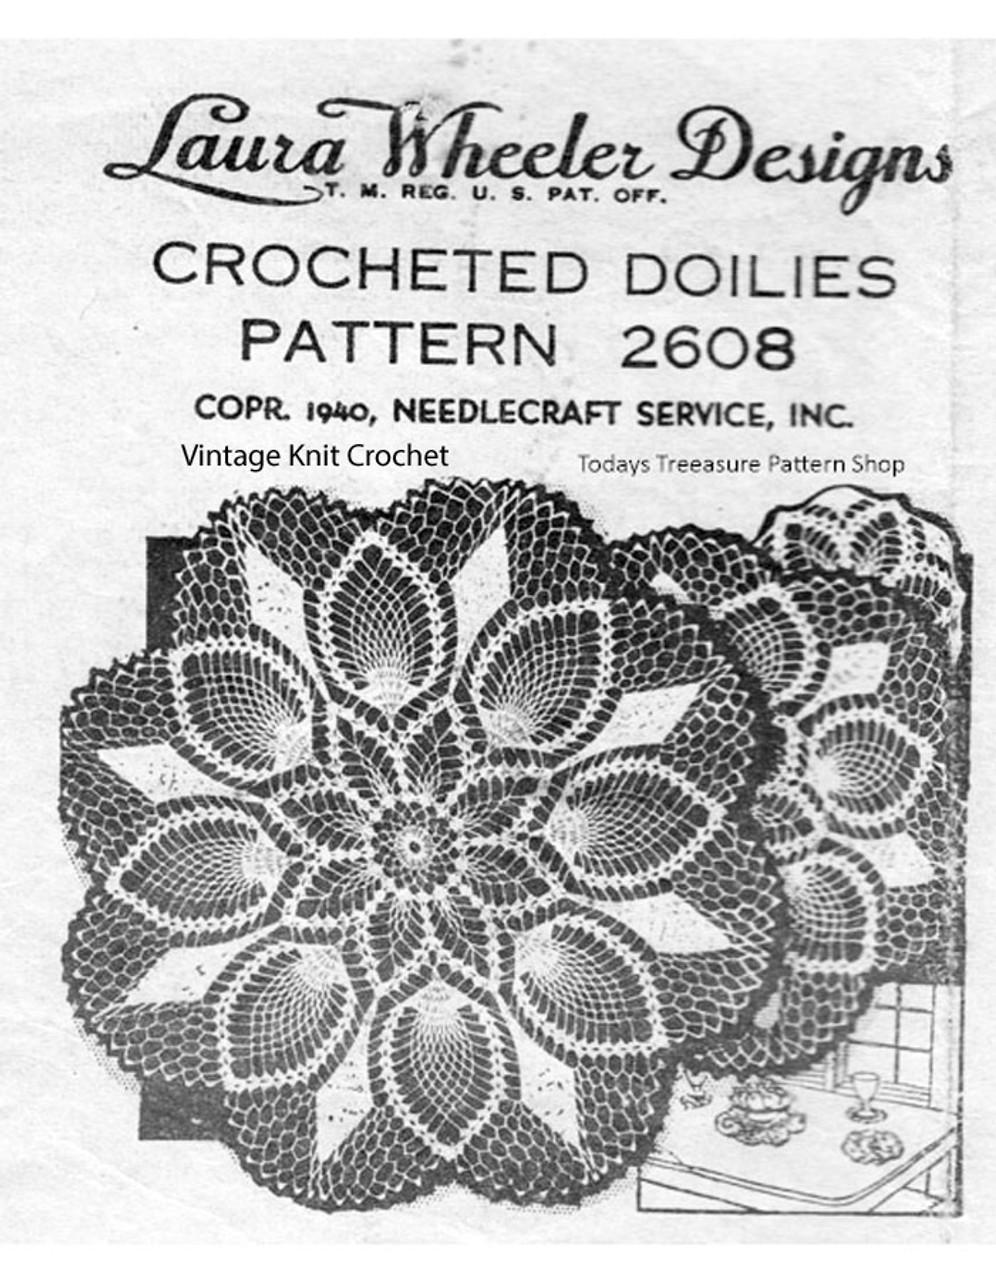 Pineapple Crochet Doily, Three Sizes, laura wheeler 2608